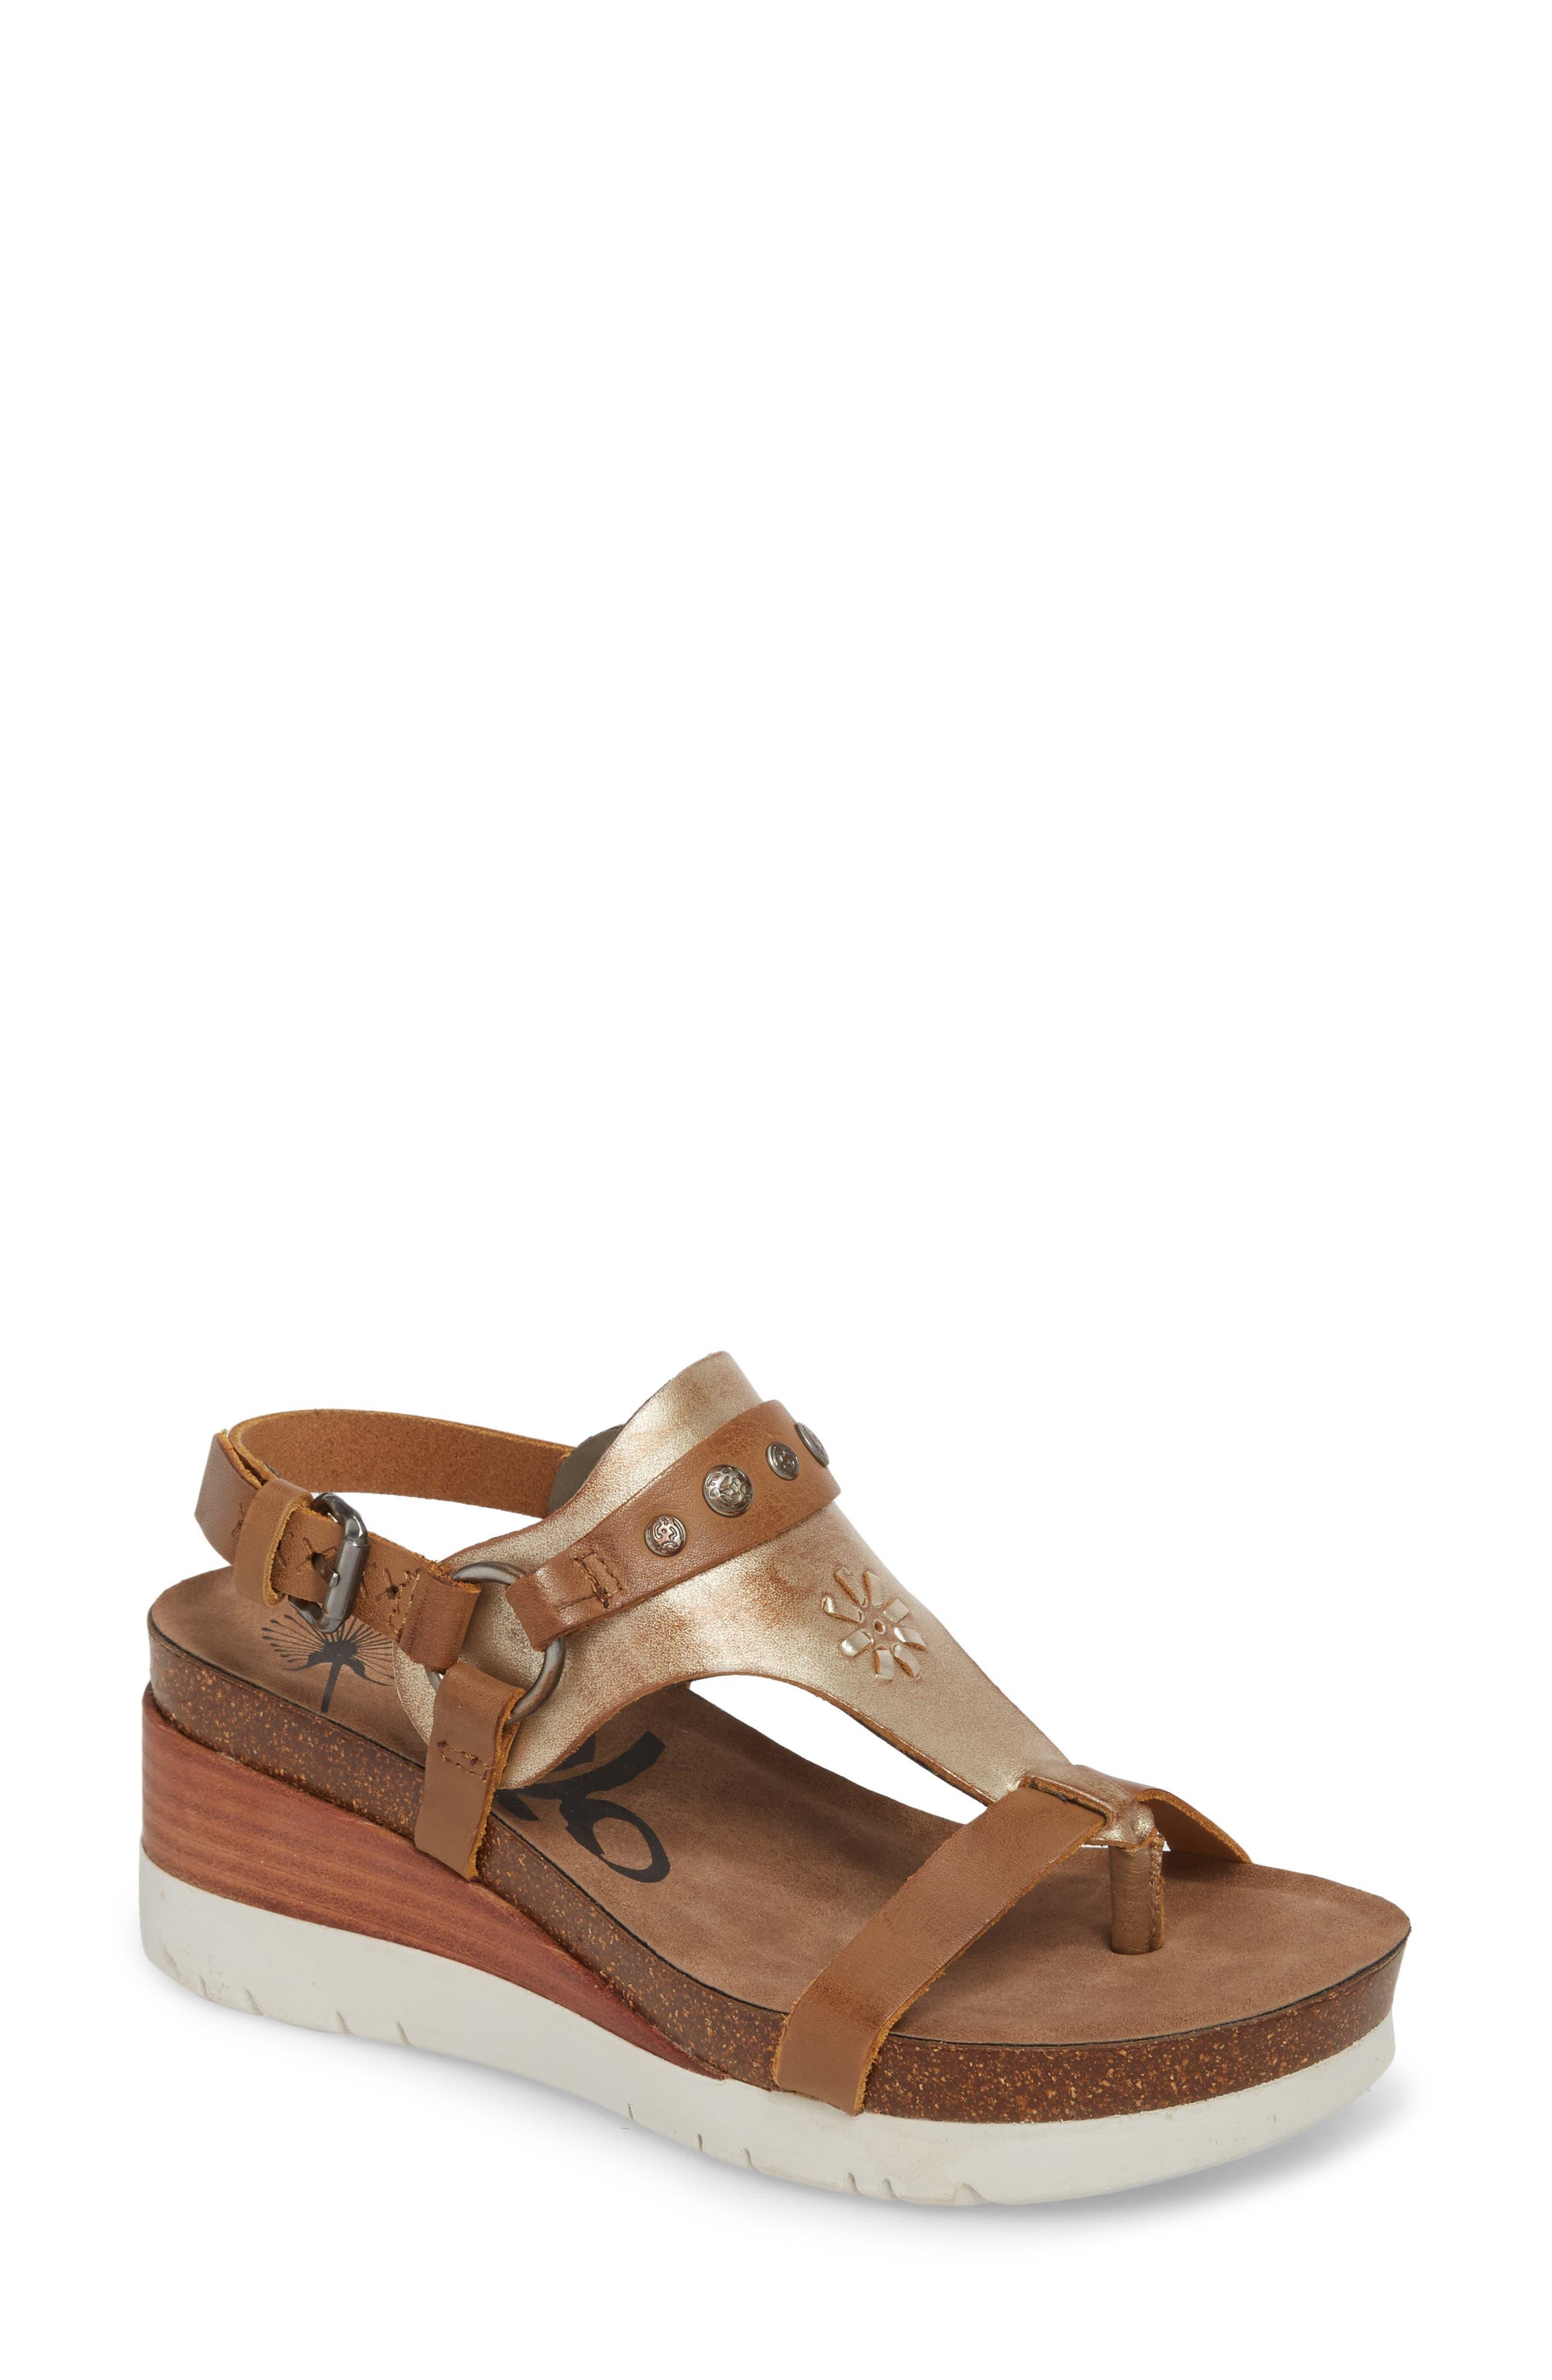 Women s Otbt Maverick Wedge Sandal E5118